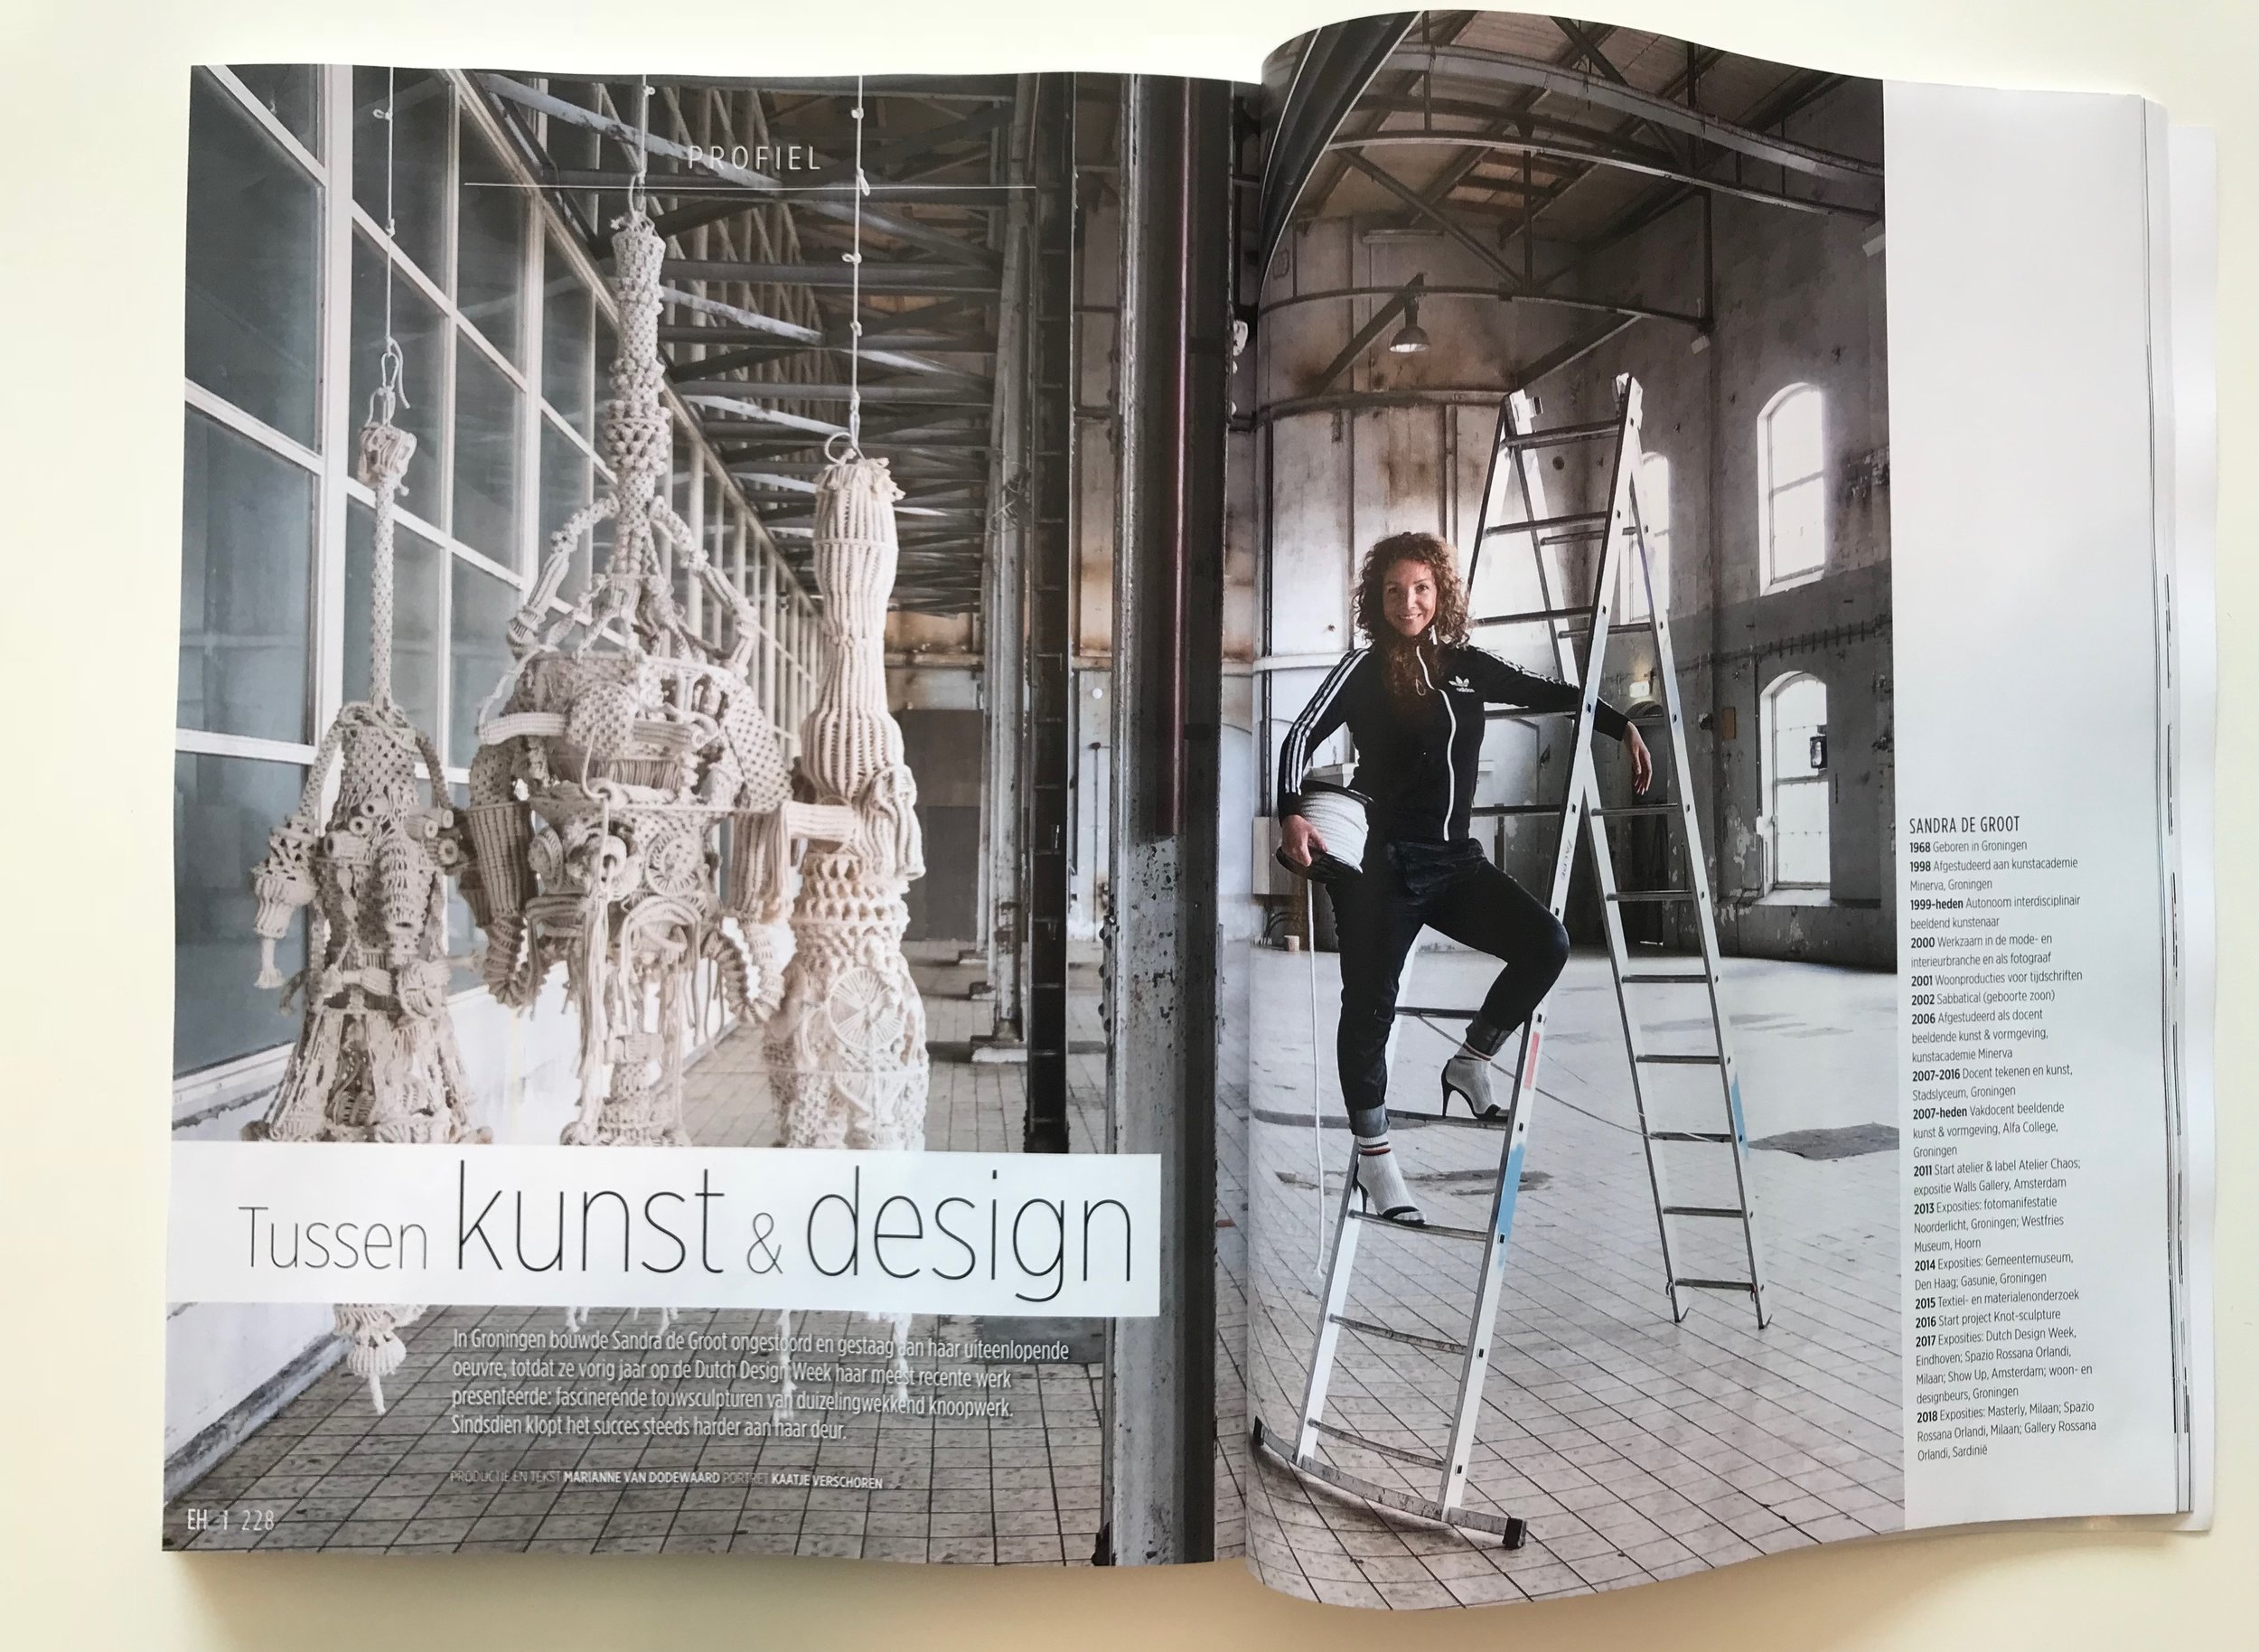 EIGEN HUIS EN INTERIEUR MAGAZINE | October 2018 | interview about Sandra's work | kNOT sculptures